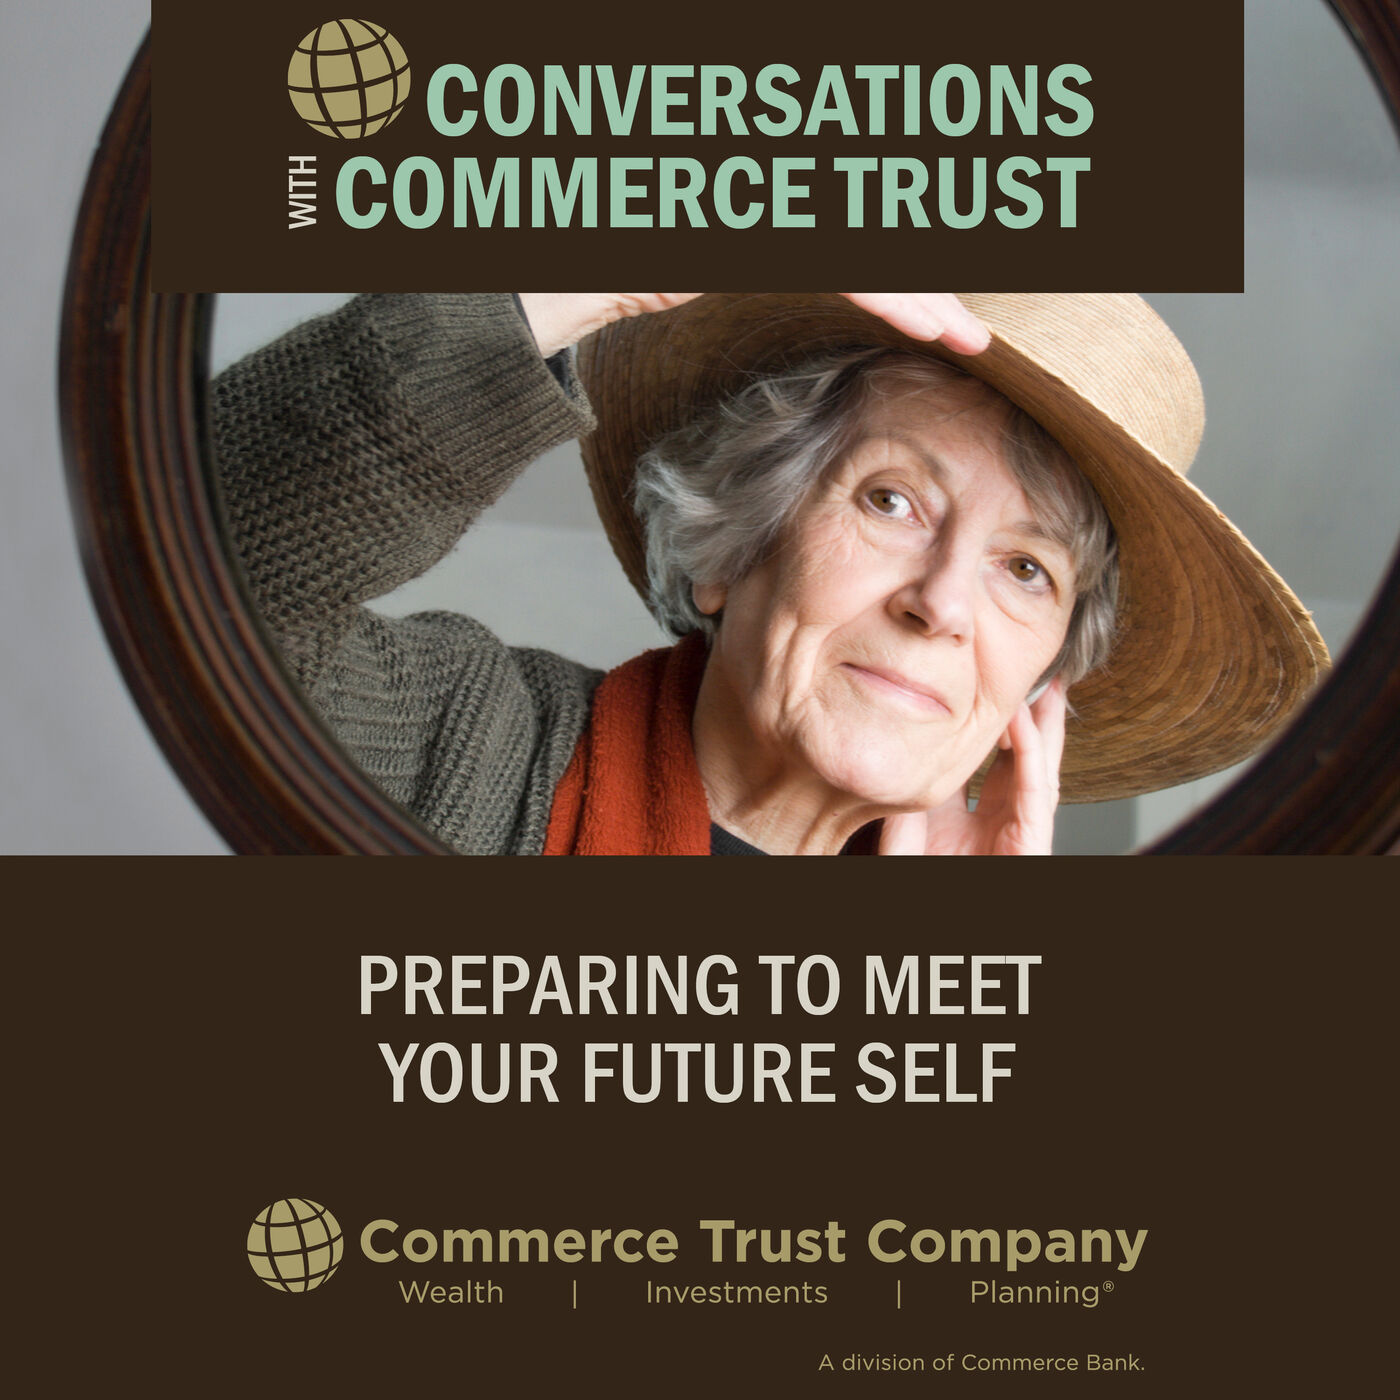 Preparing to Meet Your Future Self